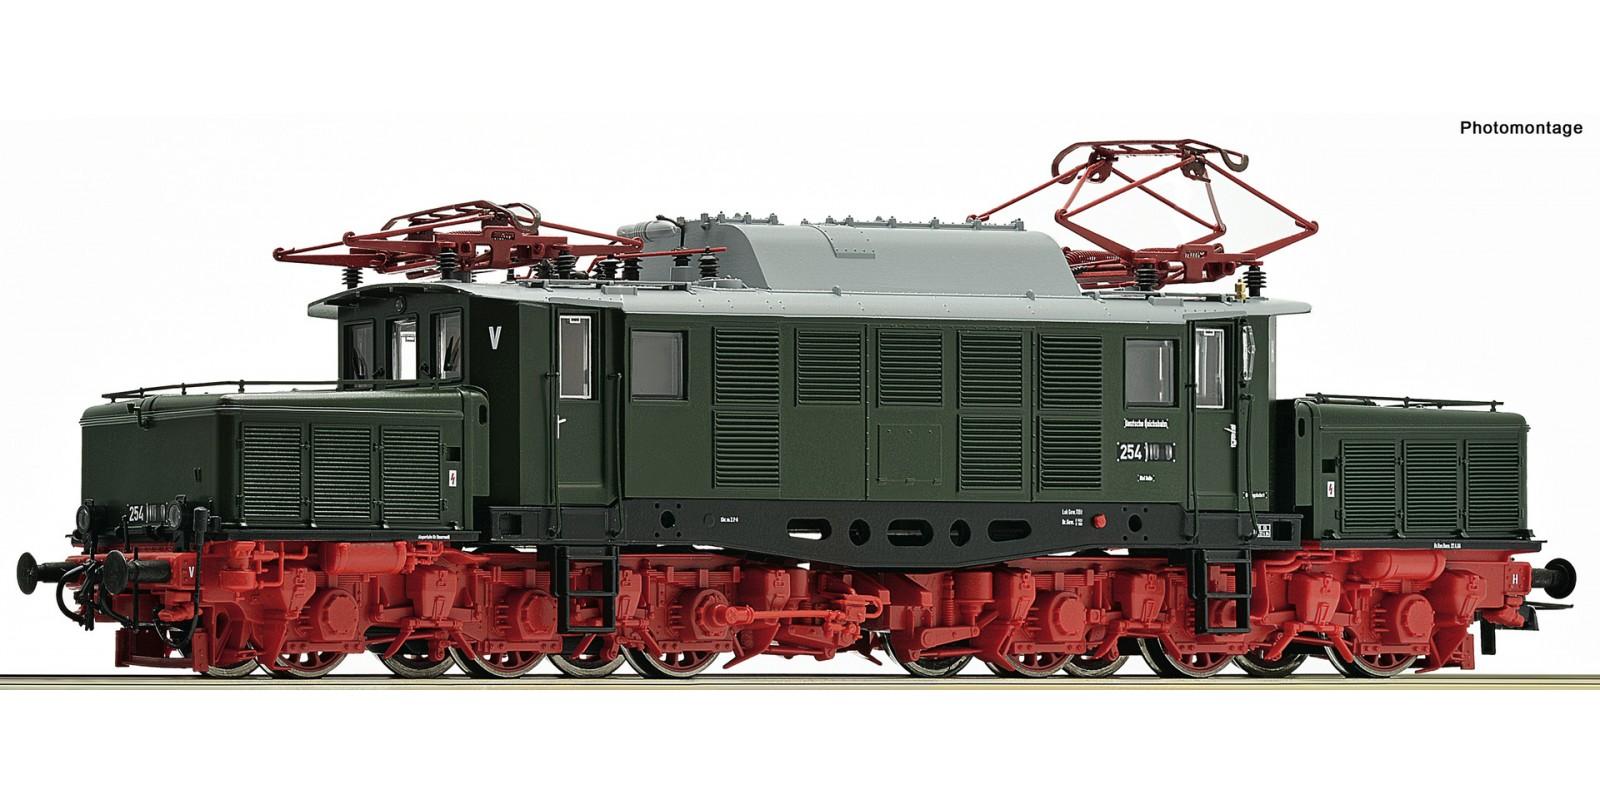 RO73363 - Electric locomotive class 254, DR